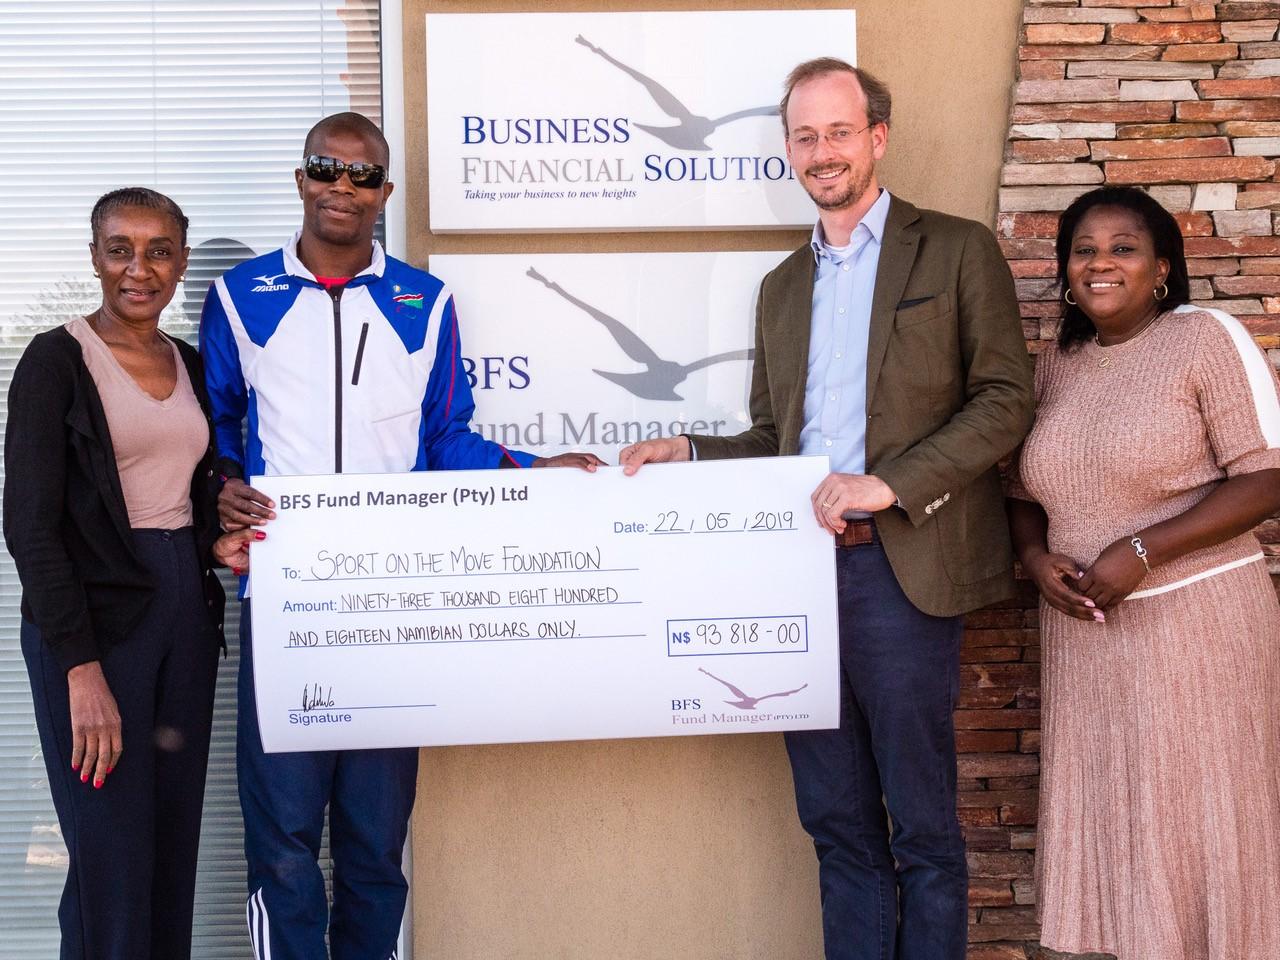 BFS handover cheque for foundatin